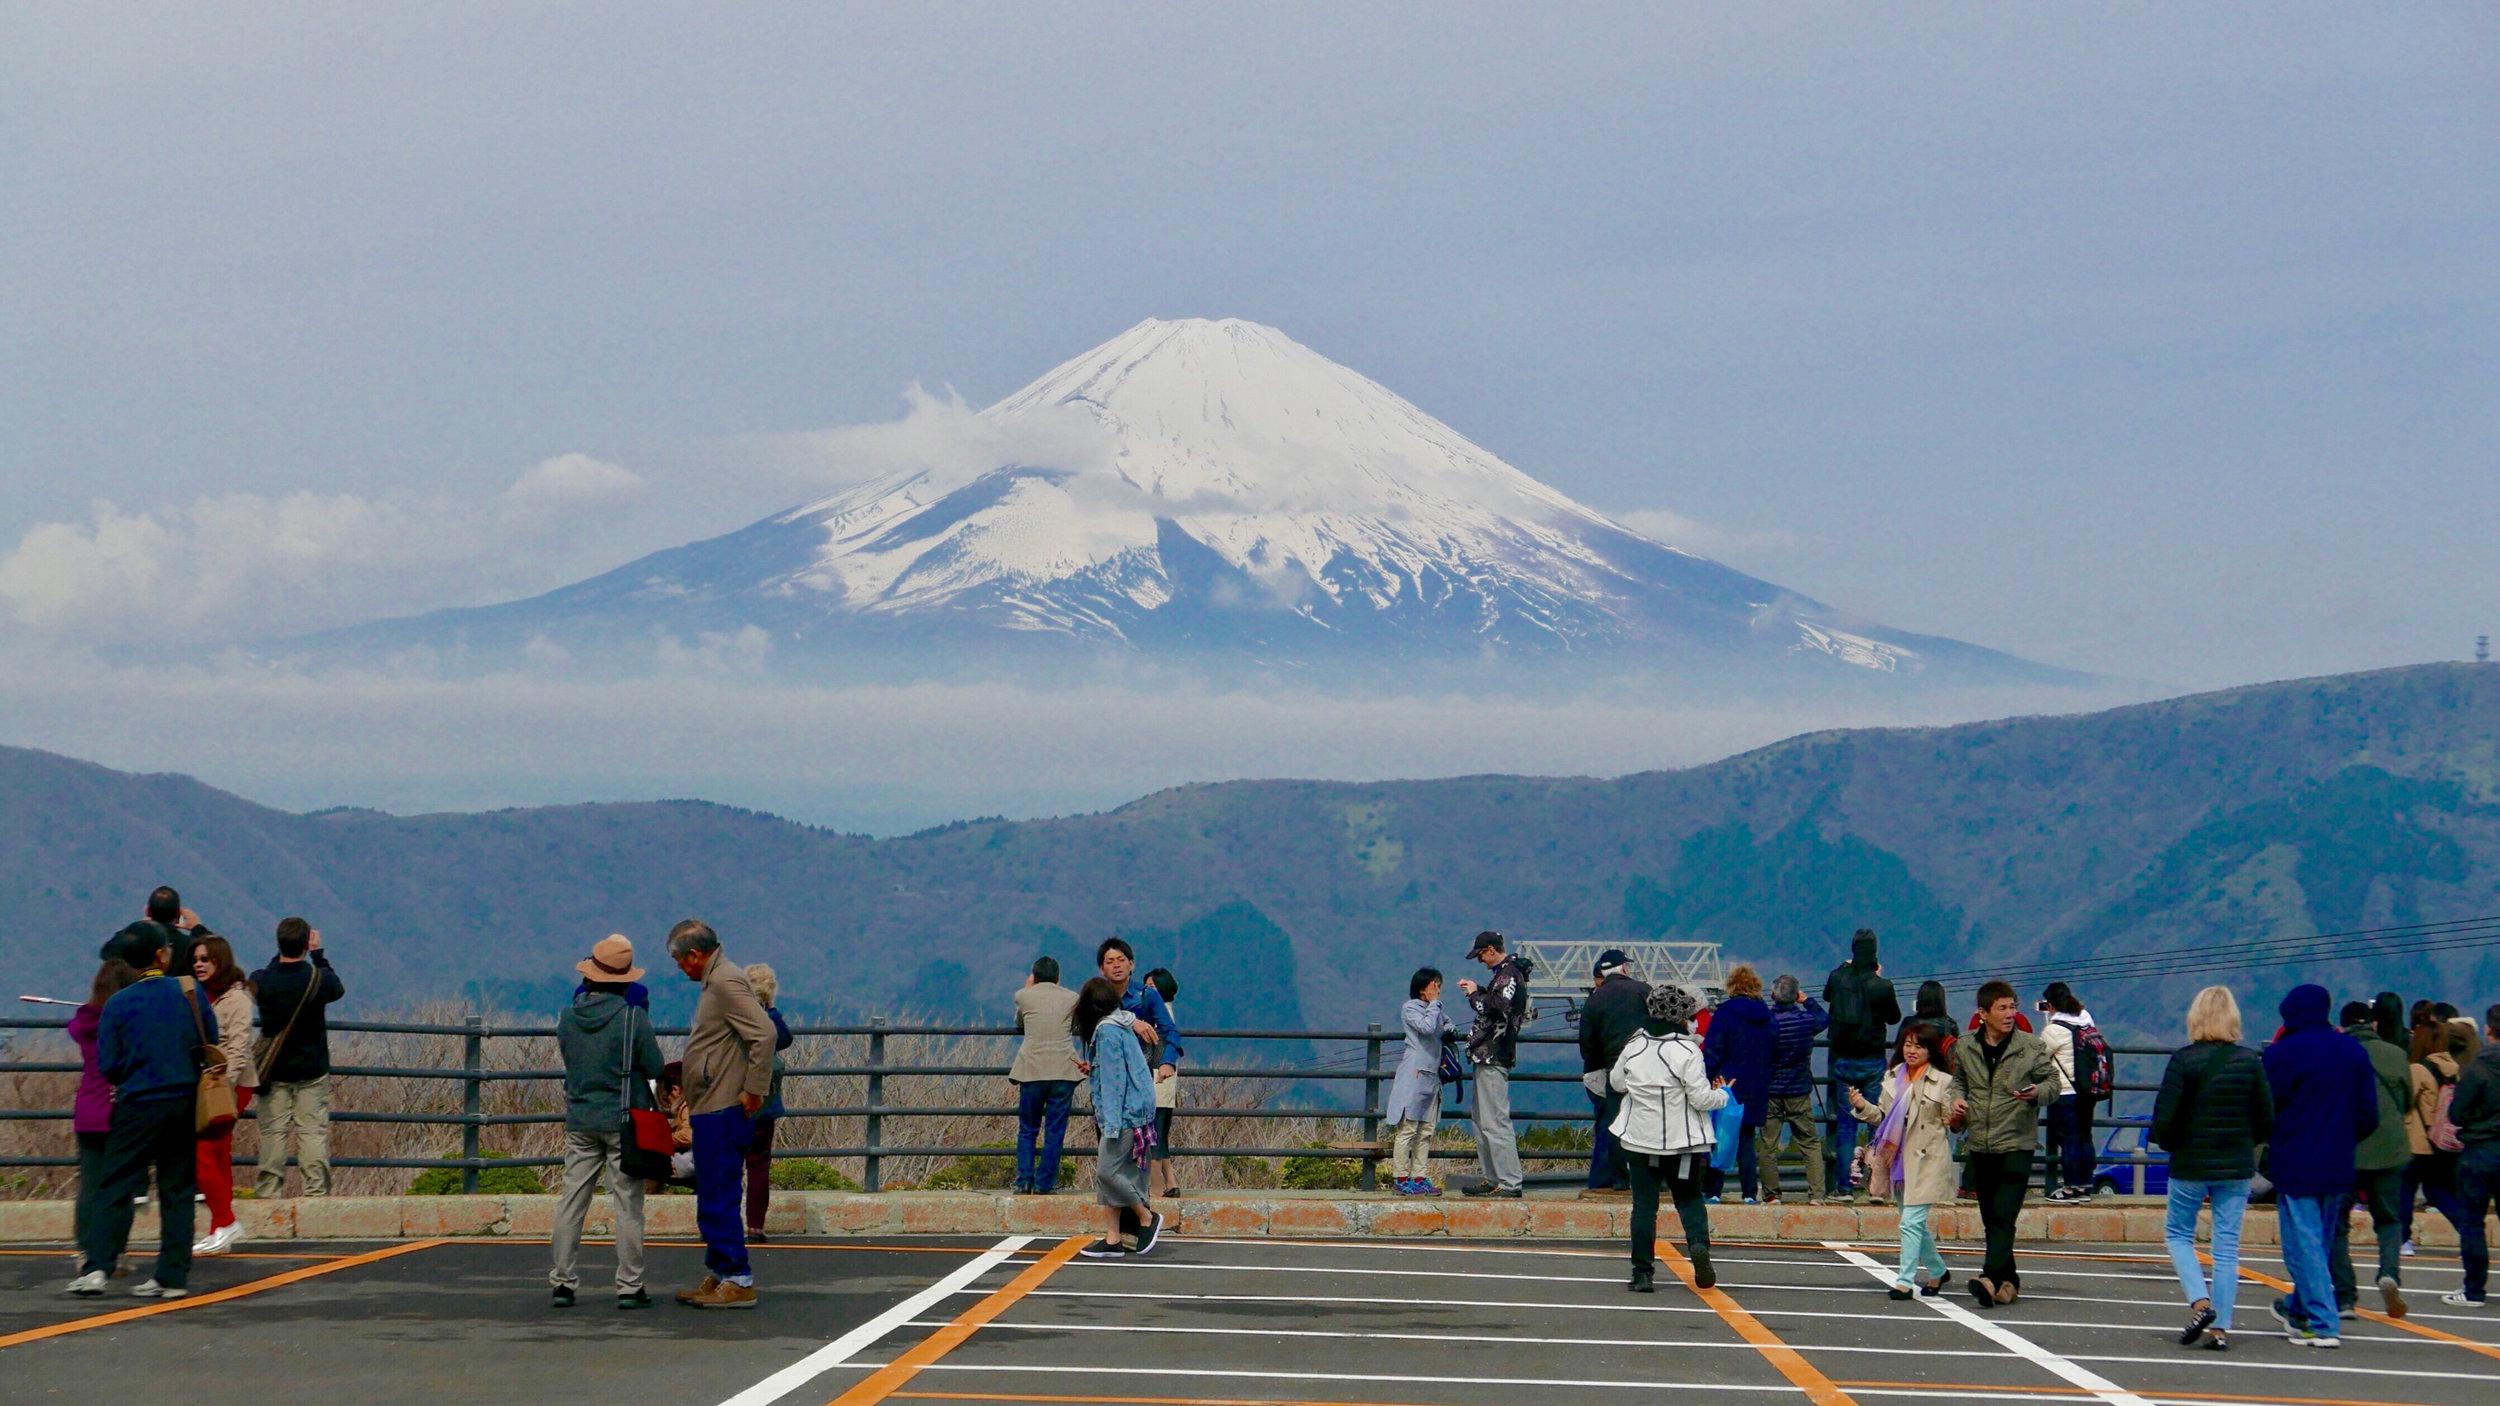 Mt Fuji from Hakone, 2017. Panasonic DMC-LX100, 34mm (70mm in 35mm equivalent)